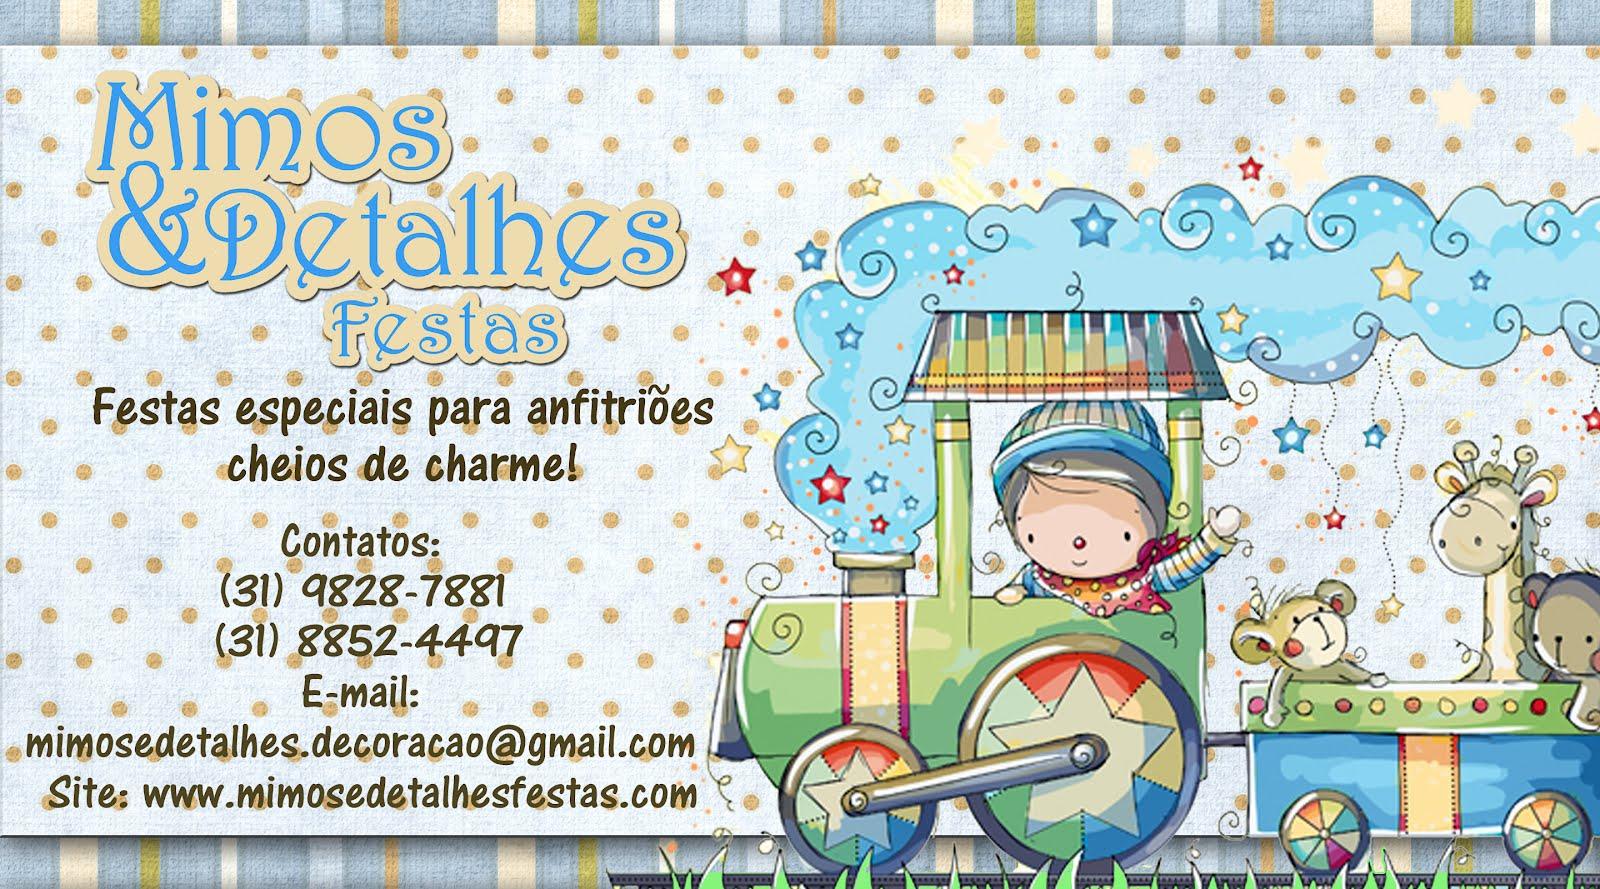 MIMOS & DETALHES FESTAS